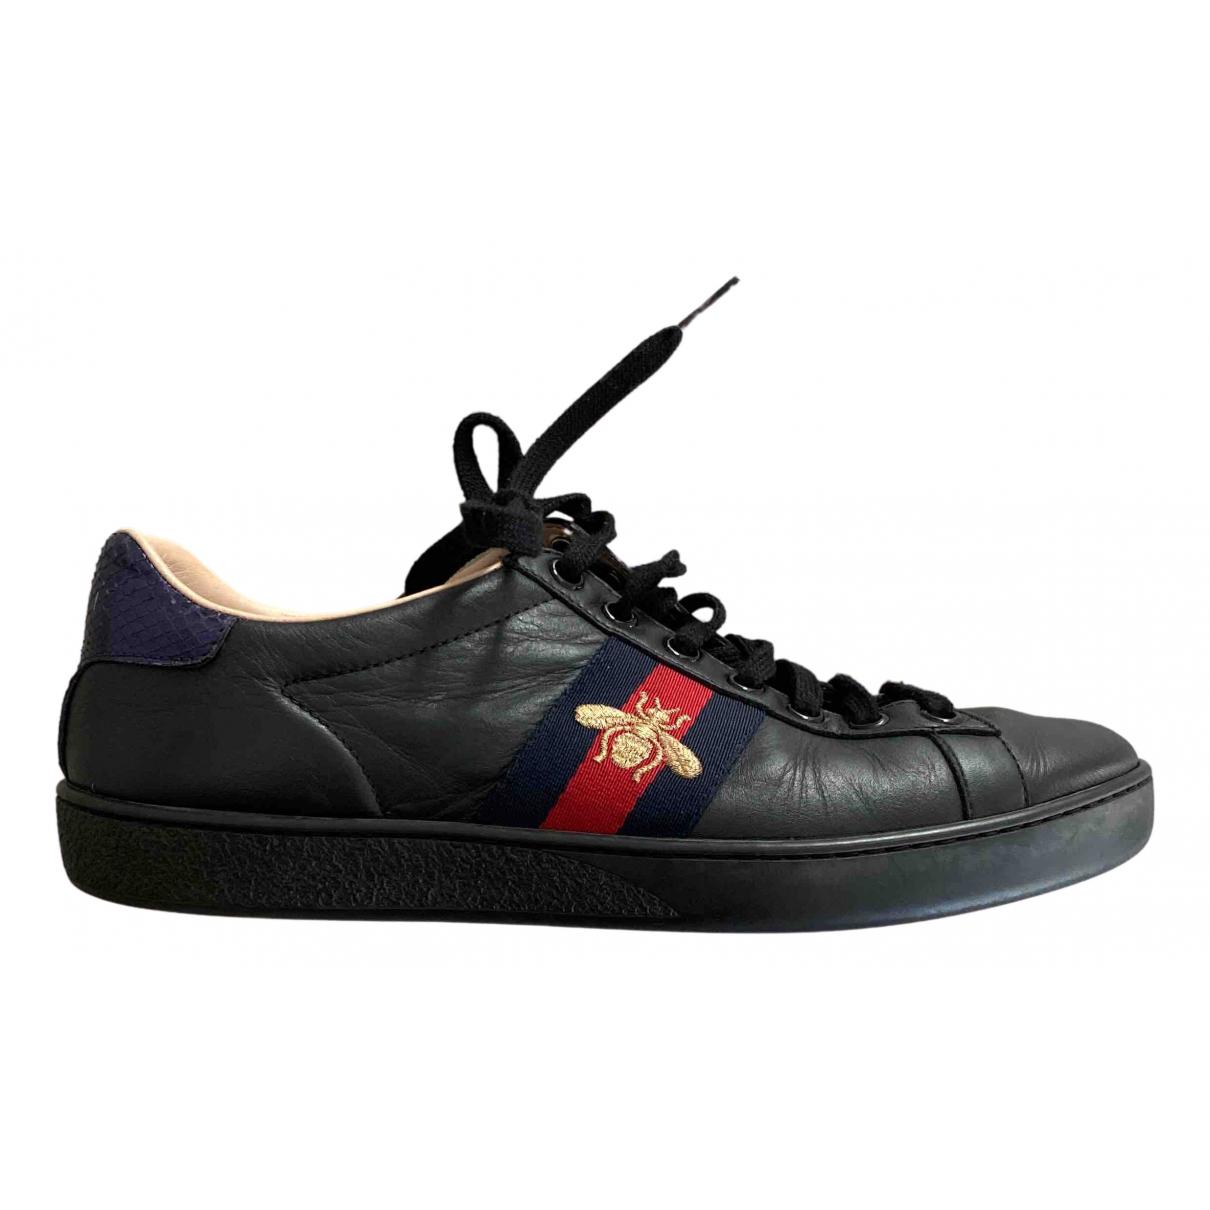 Gucci Ace Sneakers in  Schwarz Leder